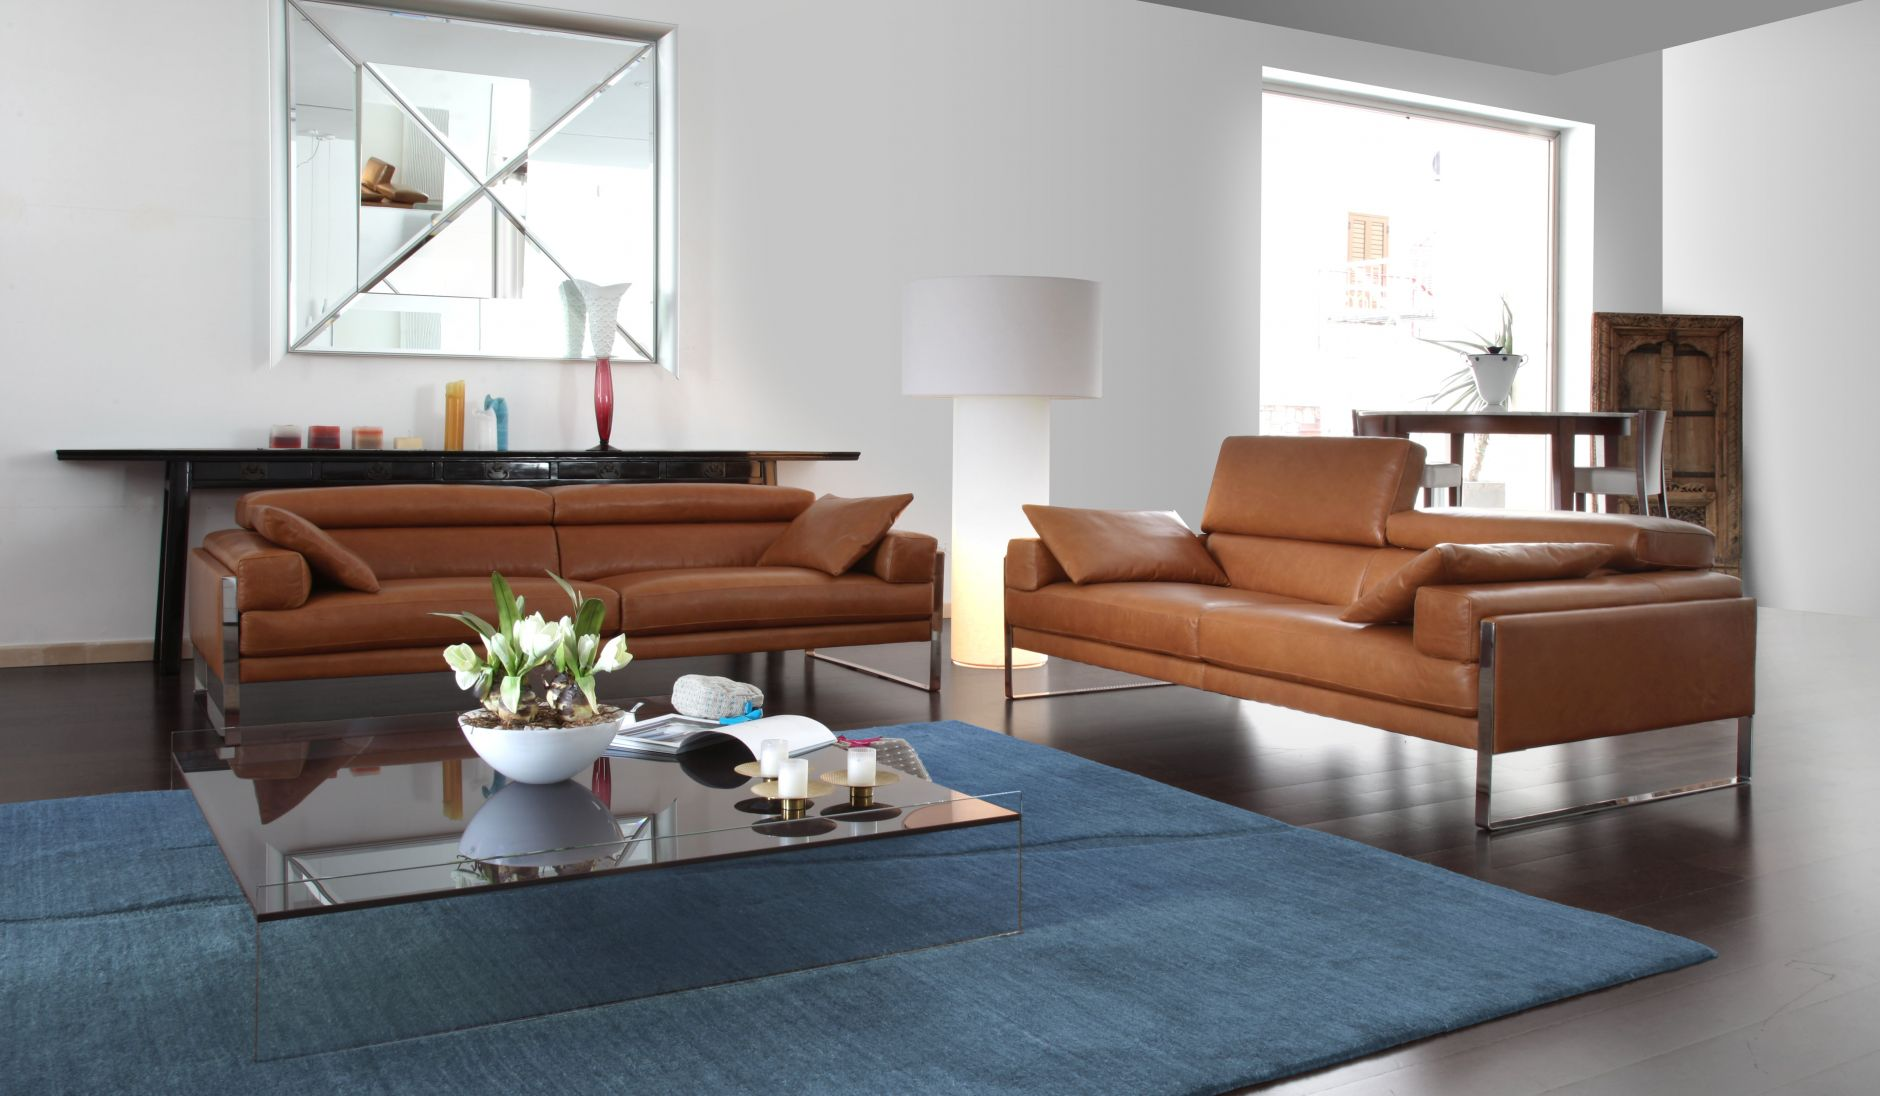 italian sofas upholstered furniture calia italia romeo 808 seriesfurniture from italy. Black Bedroom Furniture Sets. Home Design Ideas